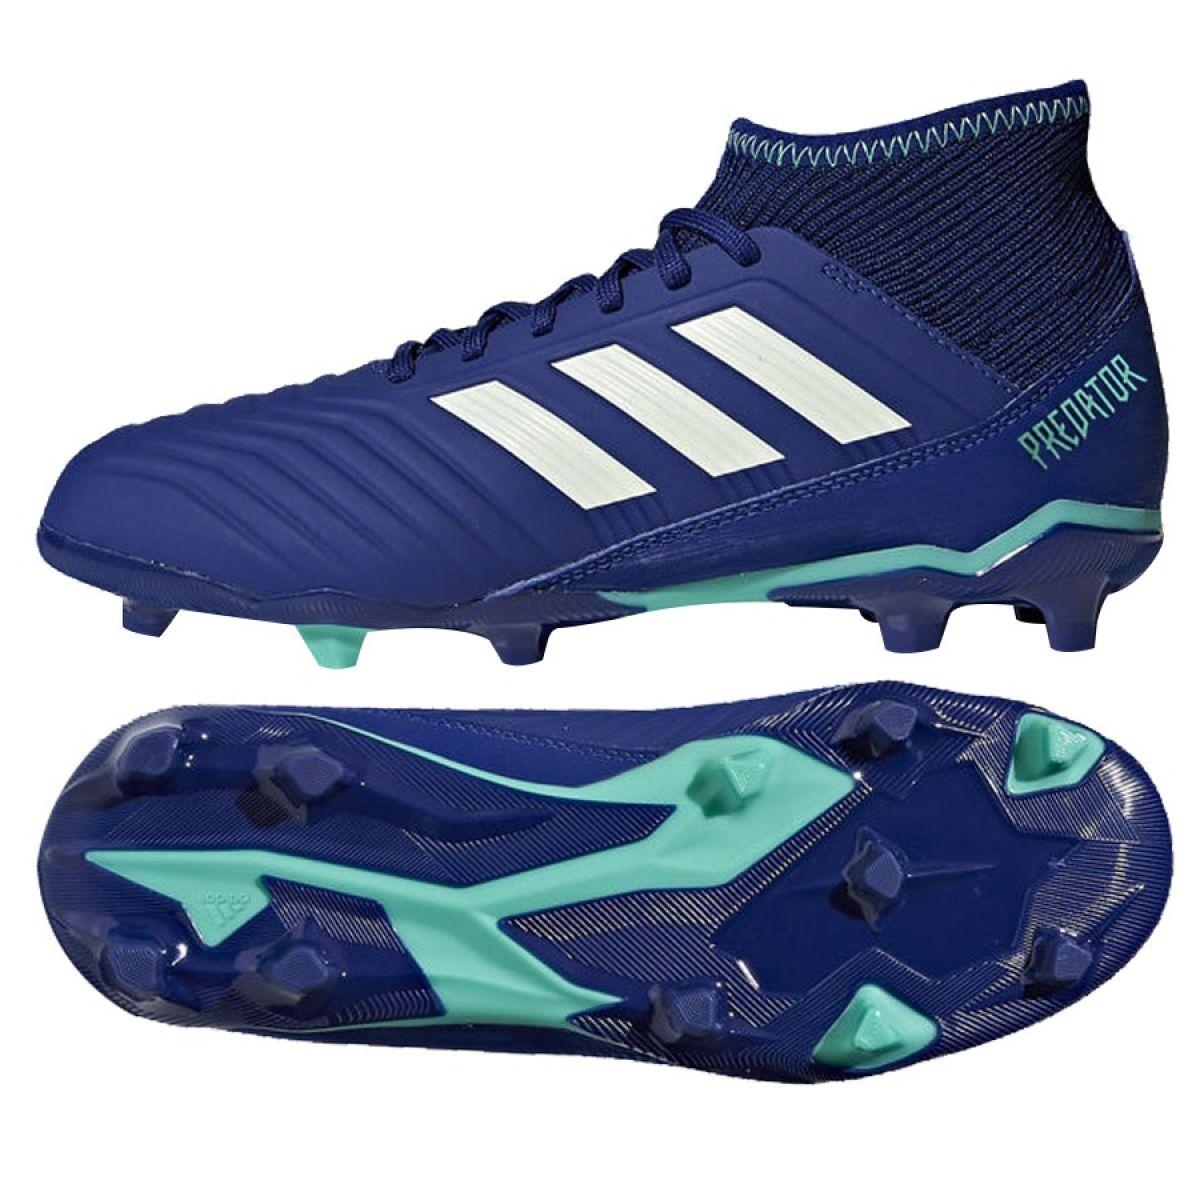 c75b1aee6950 Buty piłkarskie adidas Predator 18.3 FG Junior 38 - 7287861840 ...